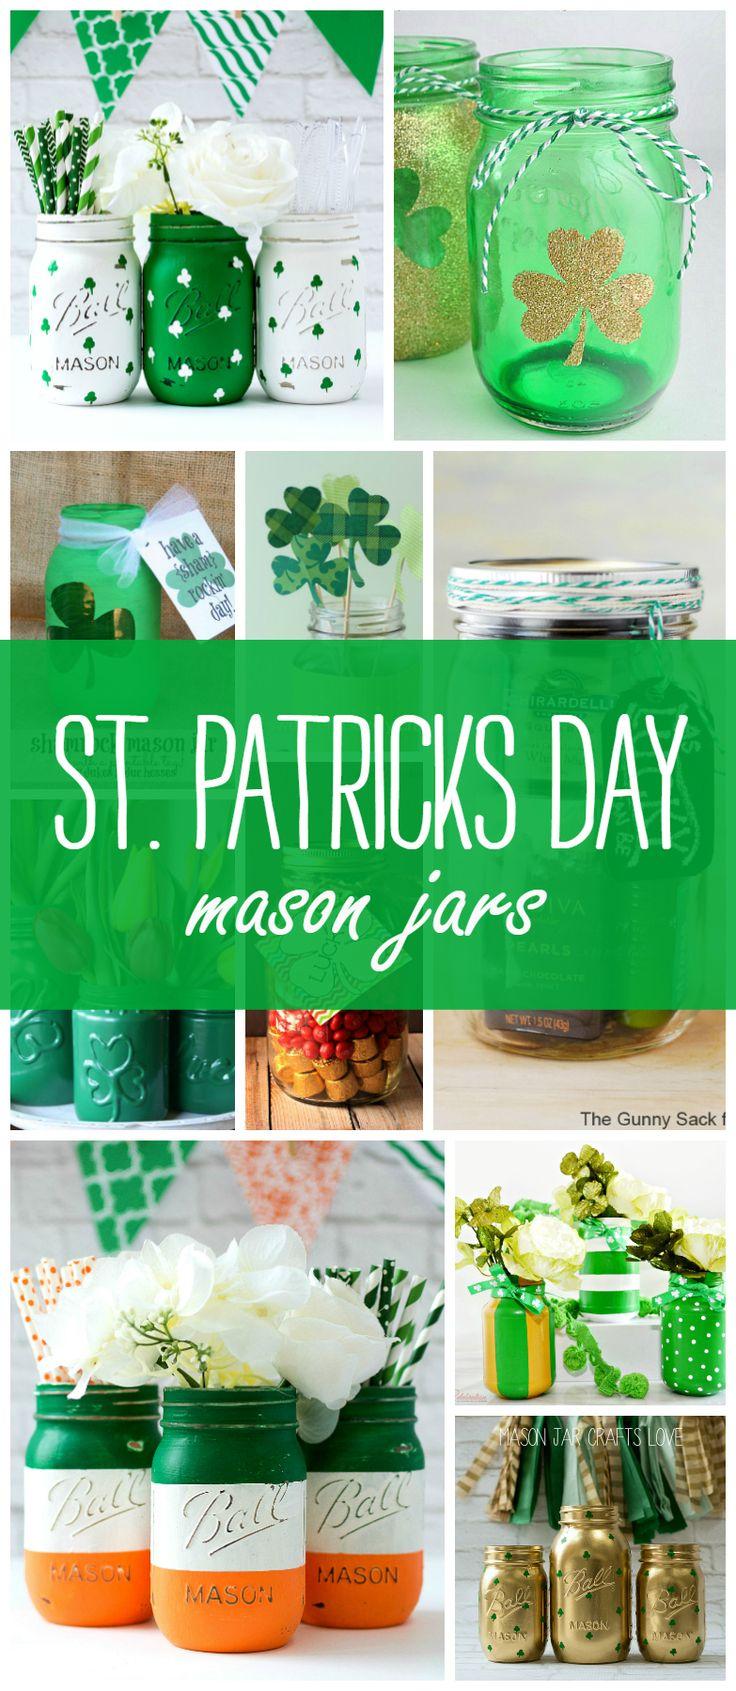 St. Patrick's Day Crafts, Recipes in Mason Jars | Mason Jar Crafts Love